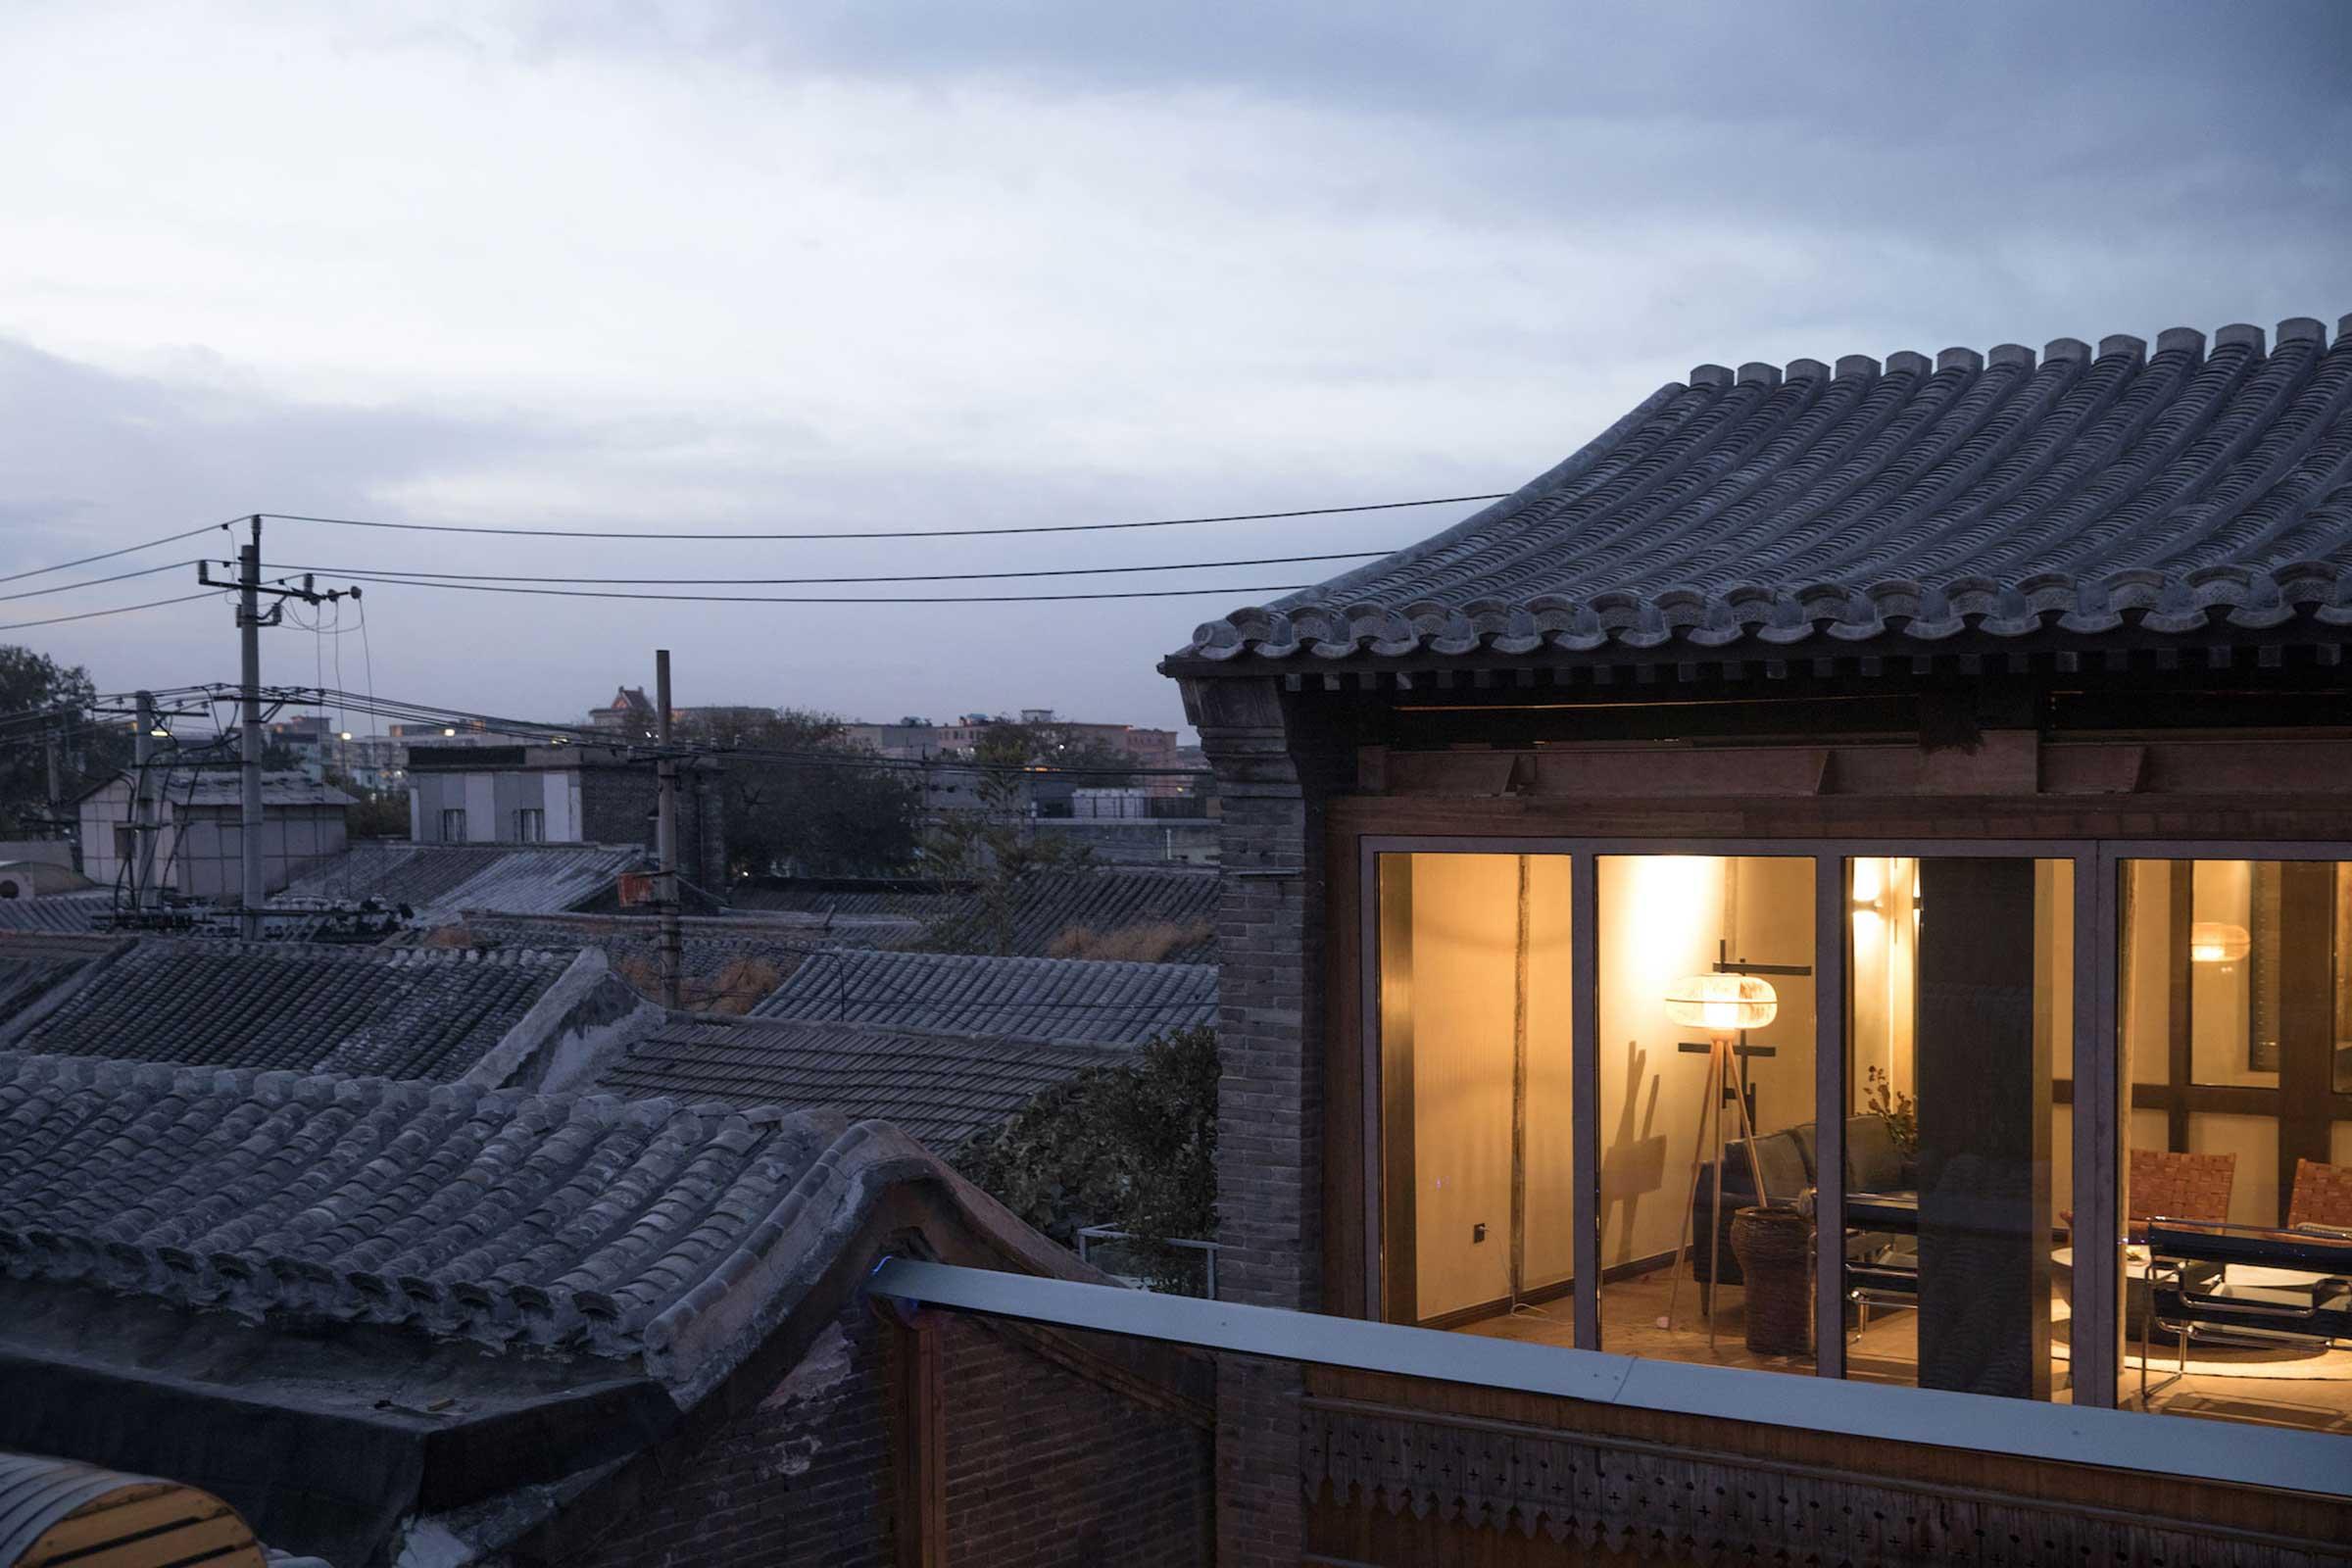 quad-house-ARCHISTRY-nolan-chao-11--inside-second-floor-facade.jpg